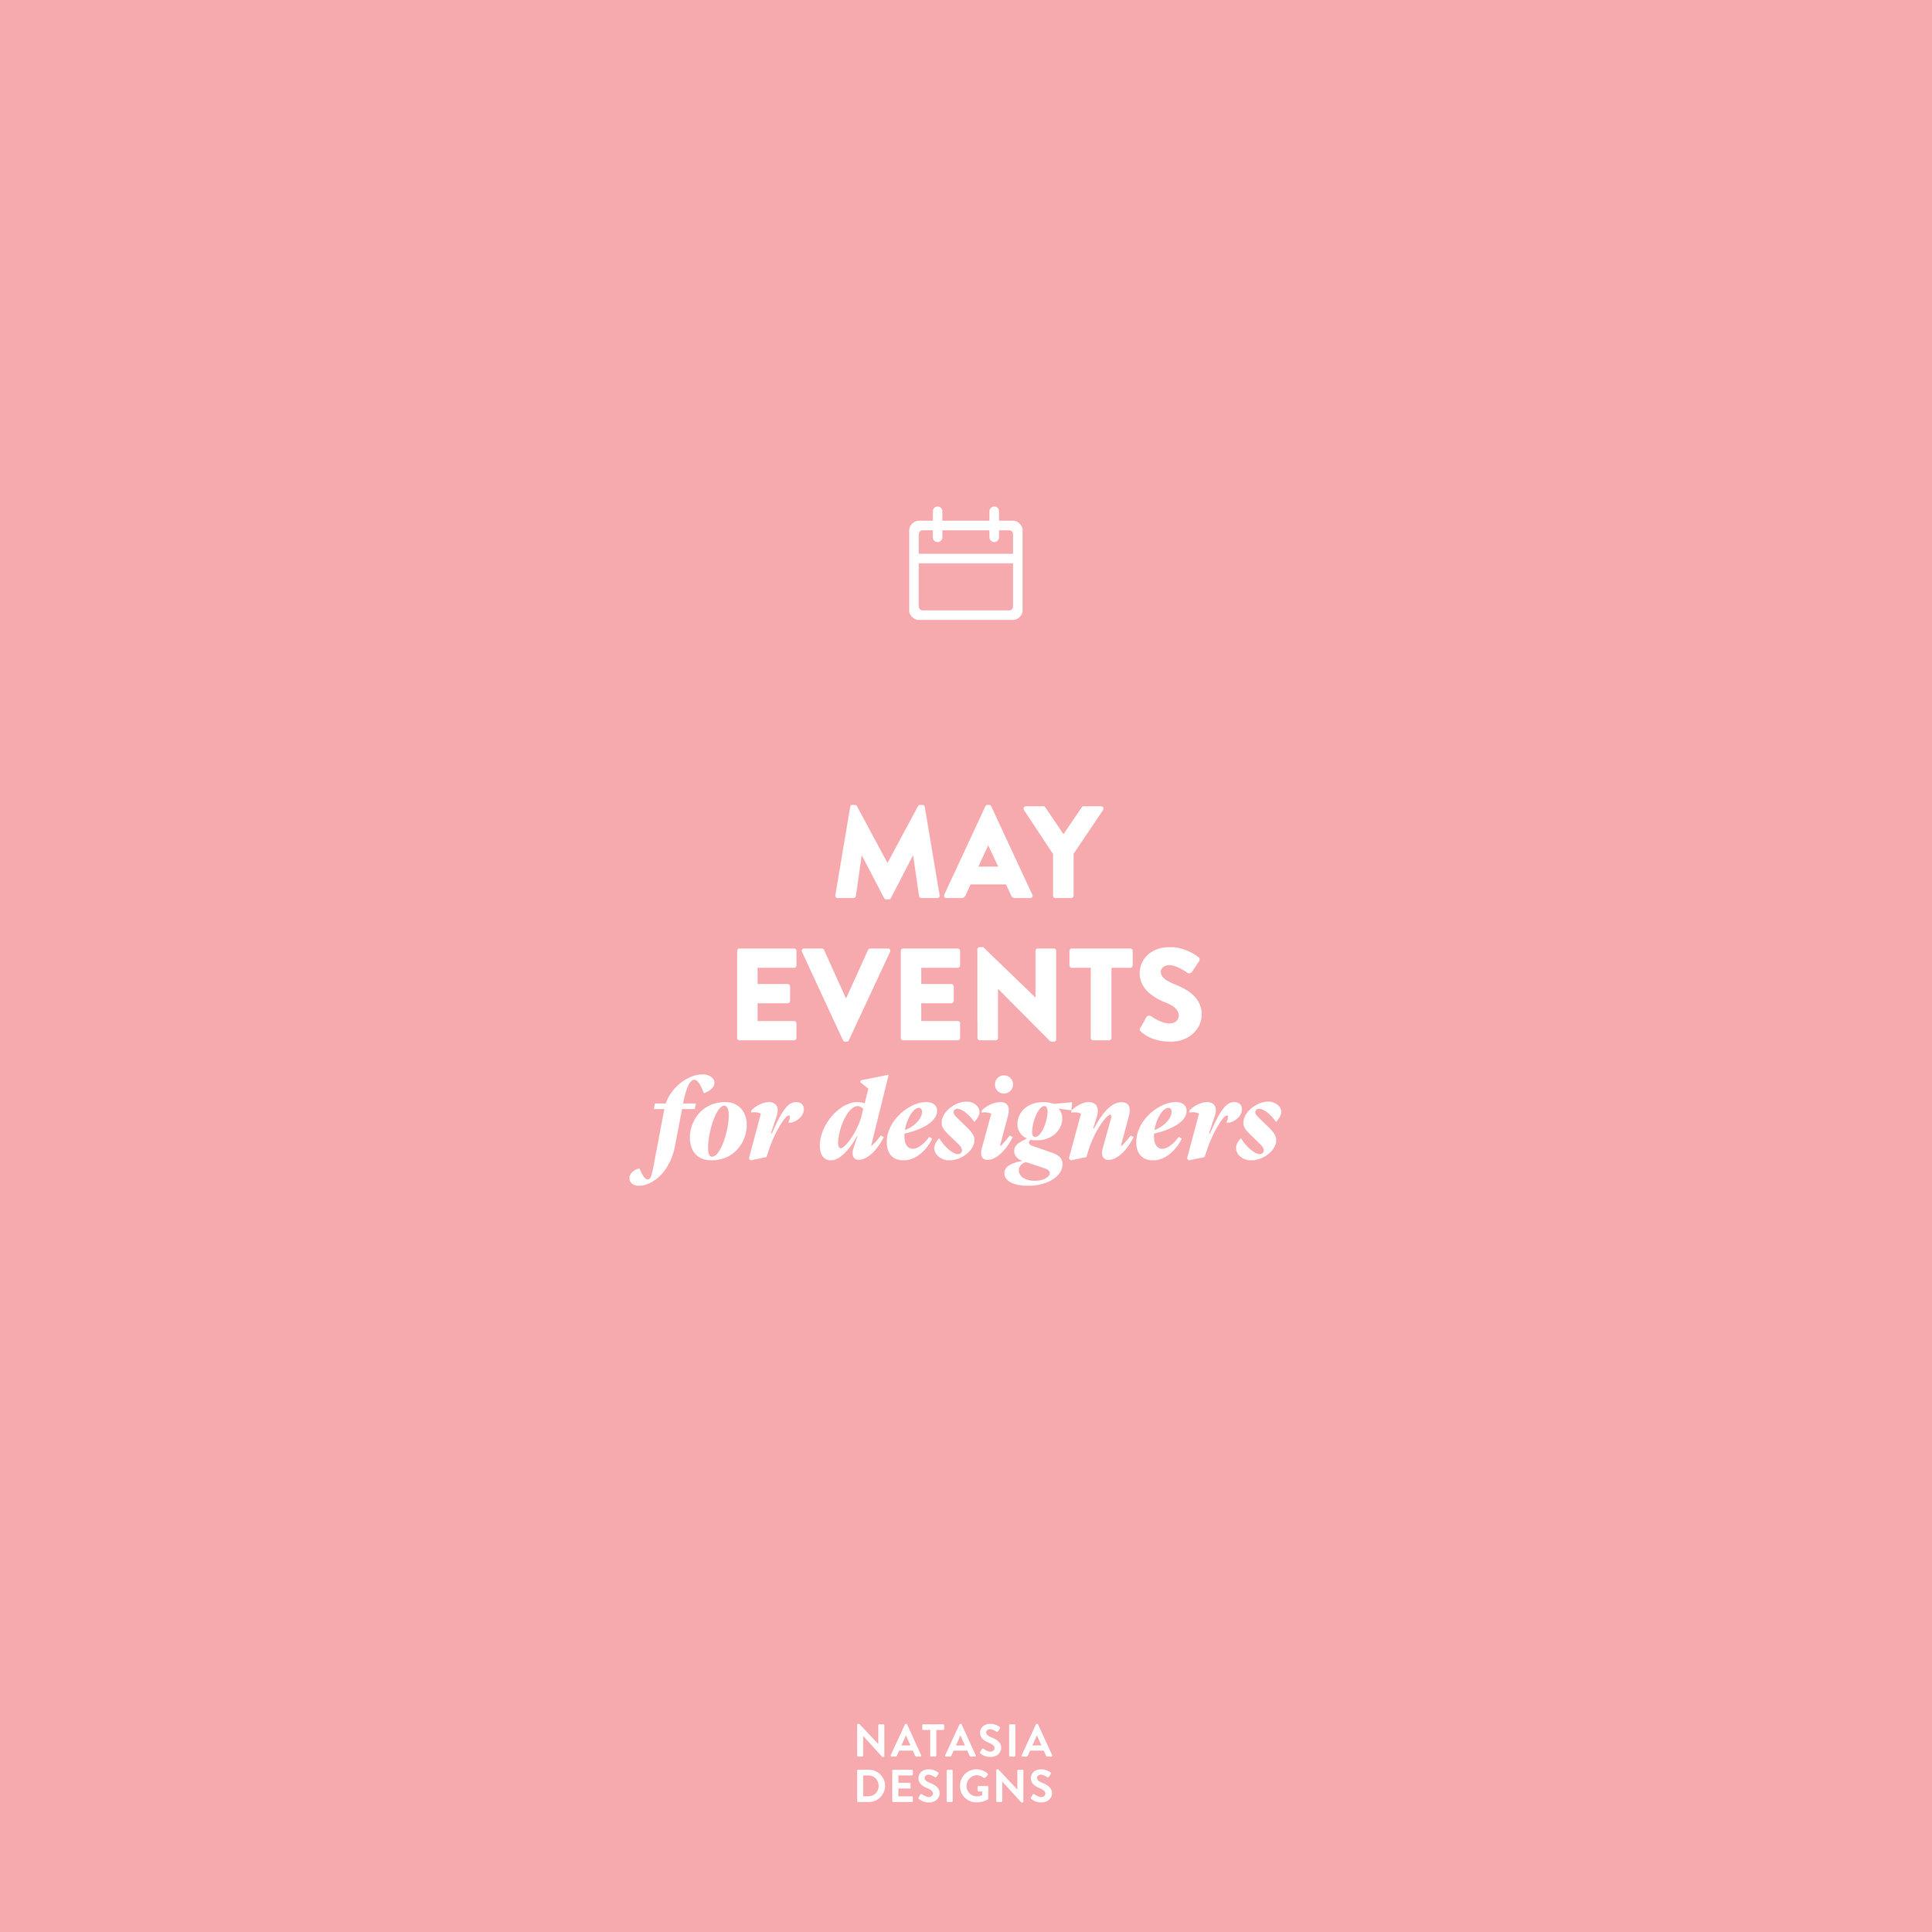 NatasiaDesigns_BlogPost_EventsMay-01.jpg